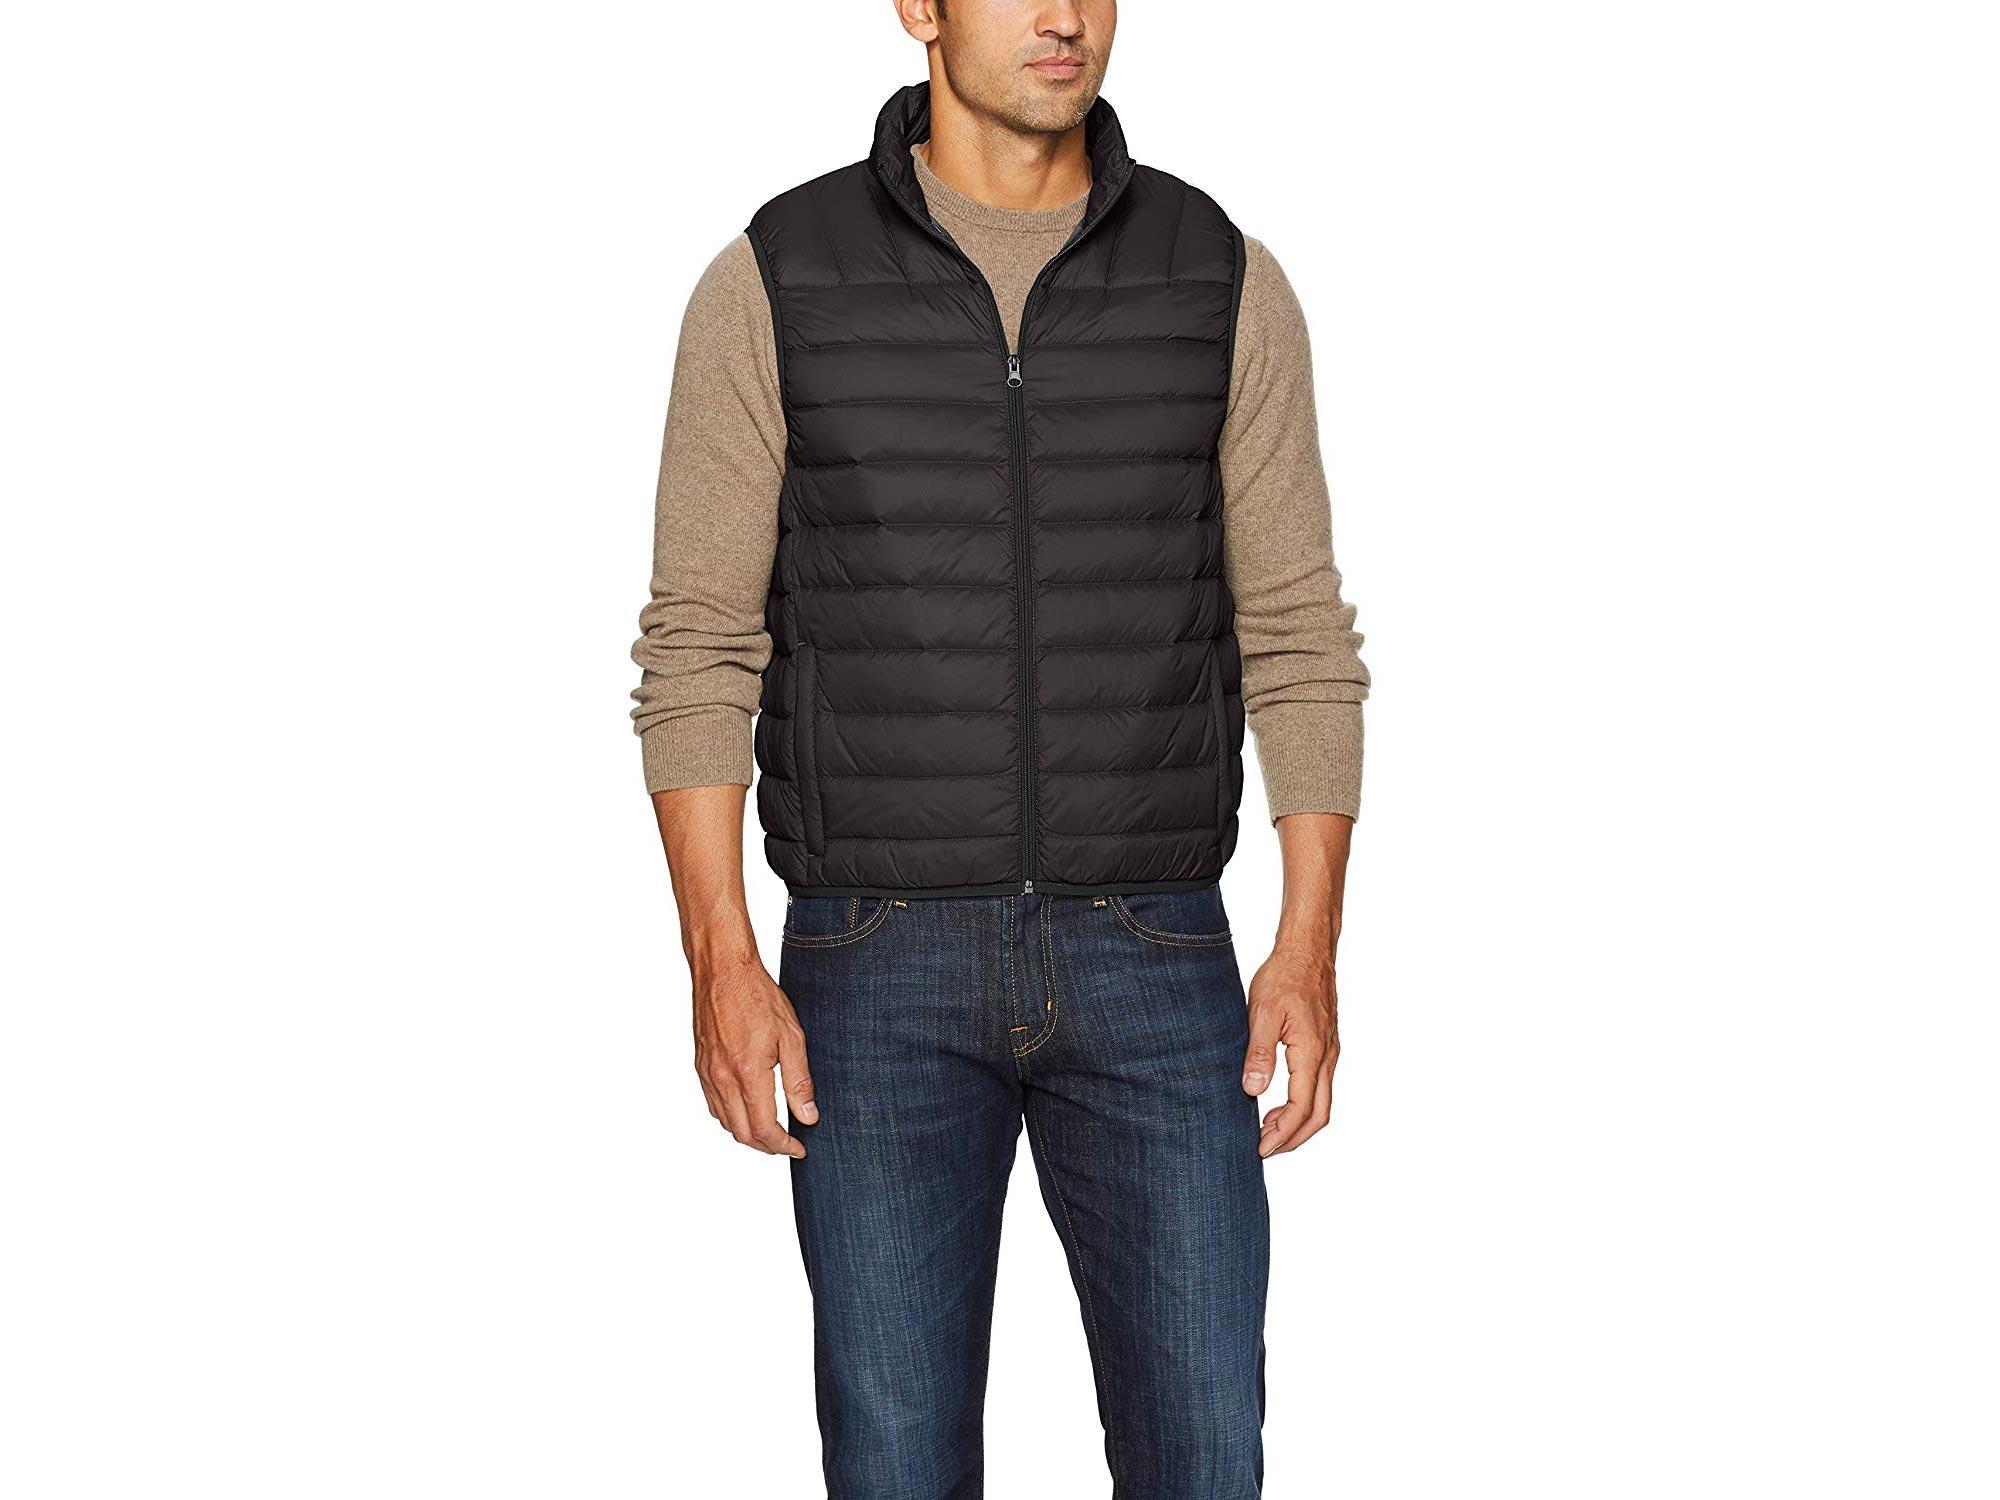 Hawke & Co Men's Lightweight Down Packable Puffer Vest